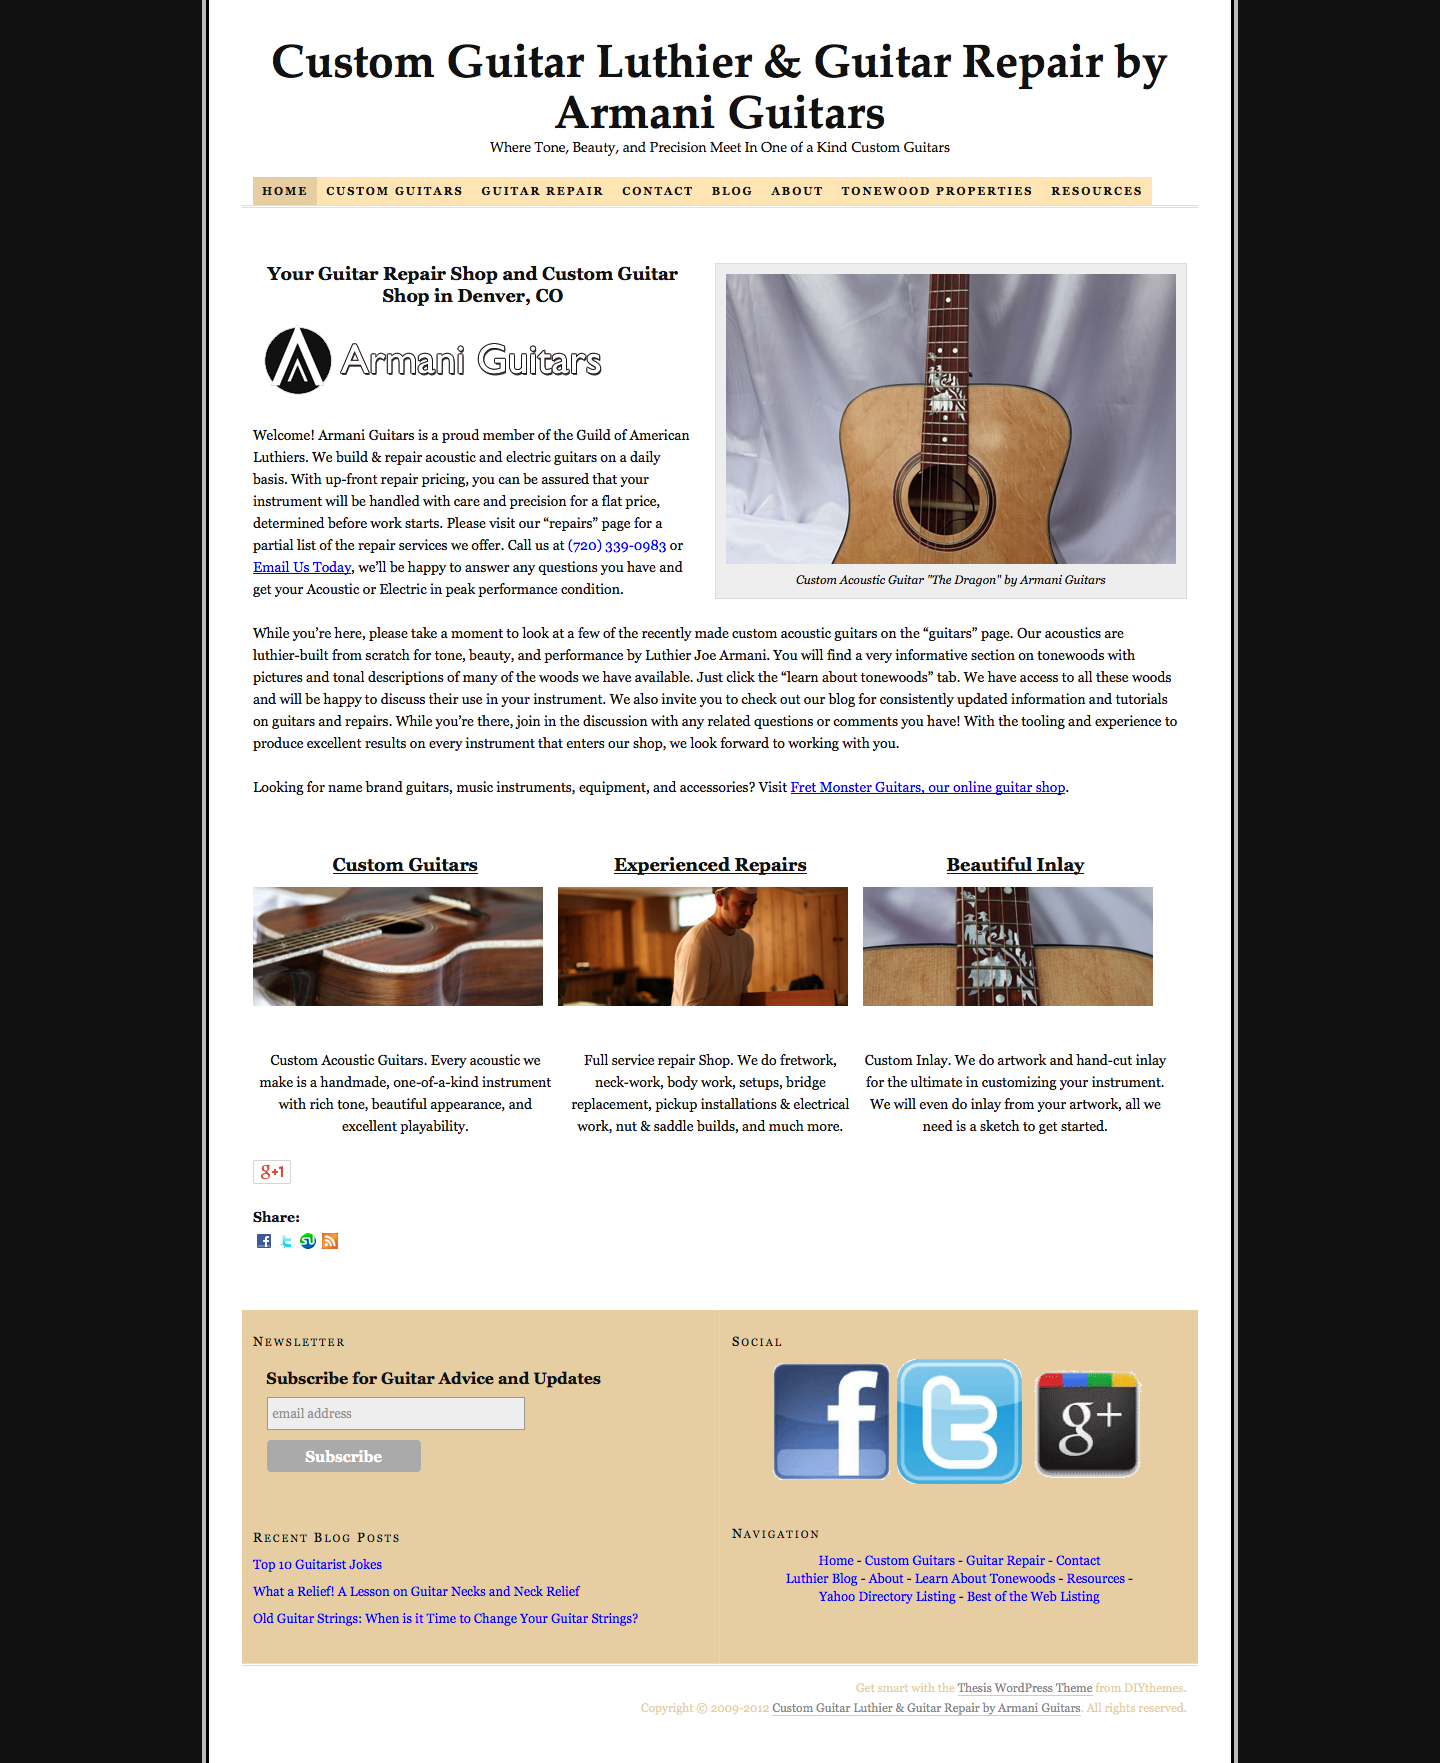 Armani Guitars